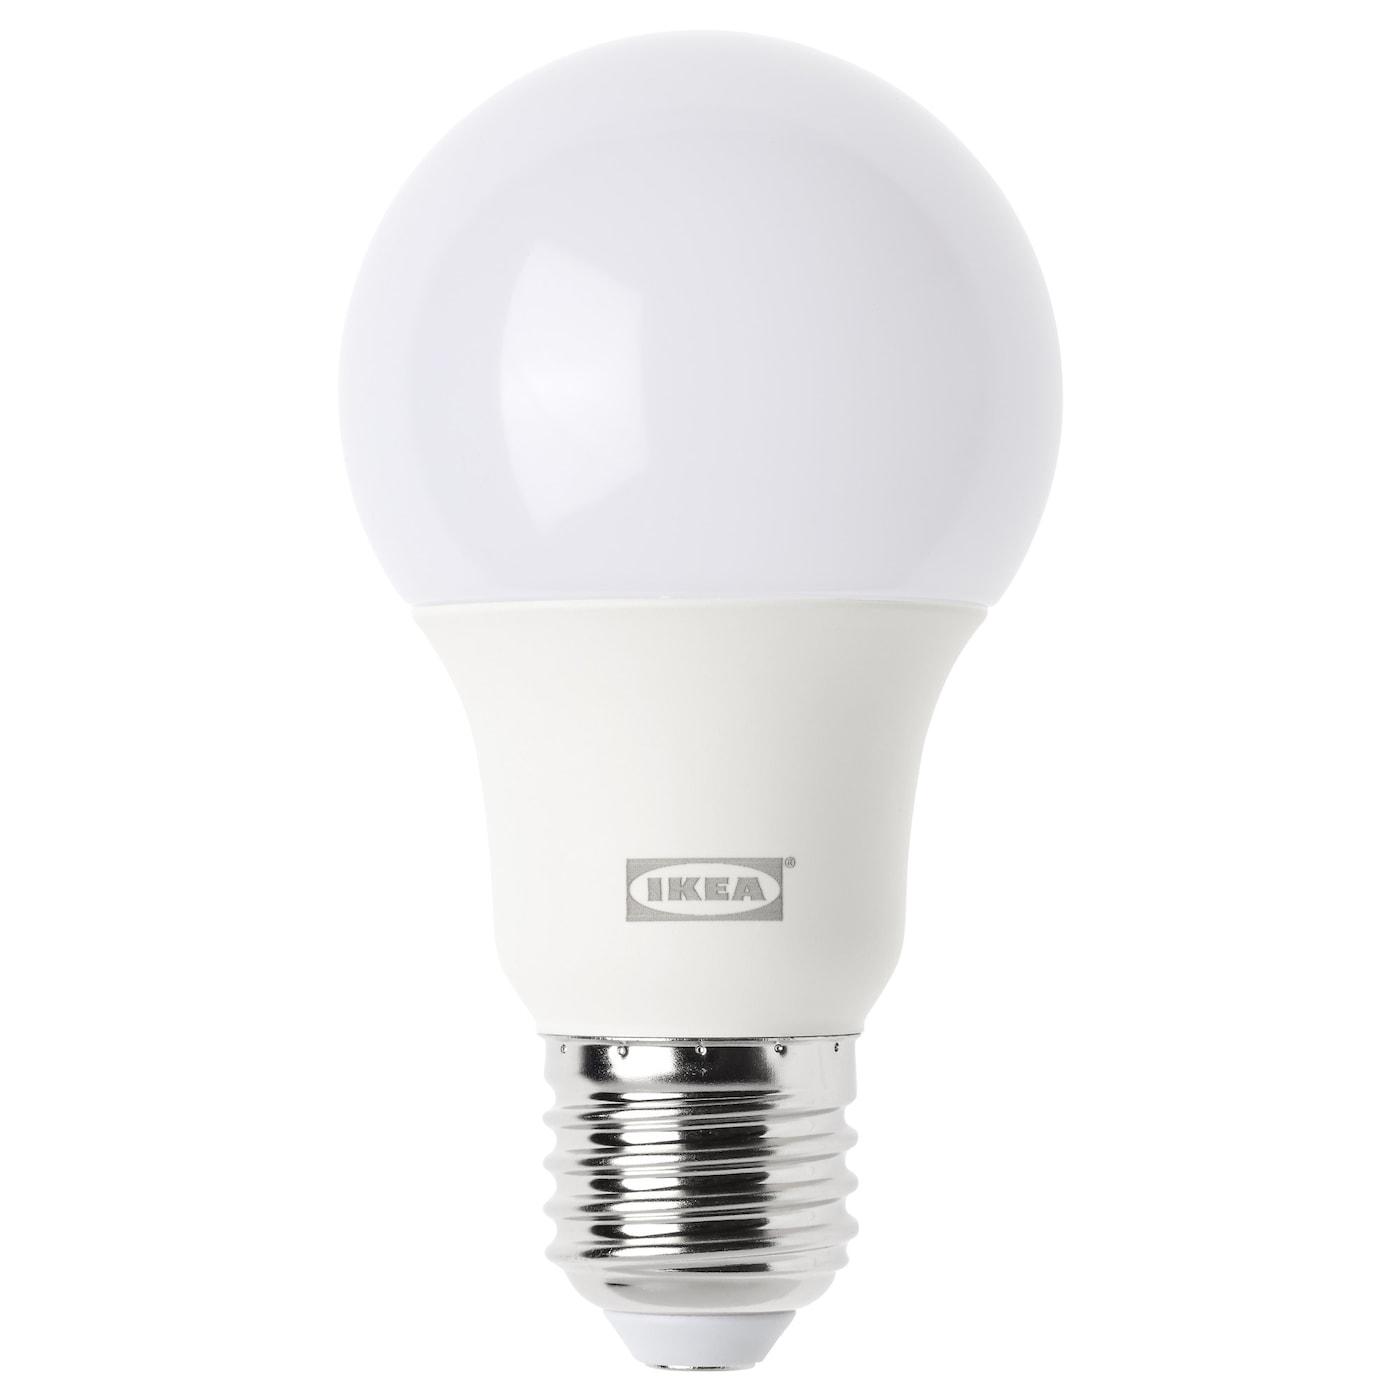 ledare led bulb e27 600 lumen dimmable globe opal white 5000k ikea. Black Bedroom Furniture Sets. Home Design Ideas